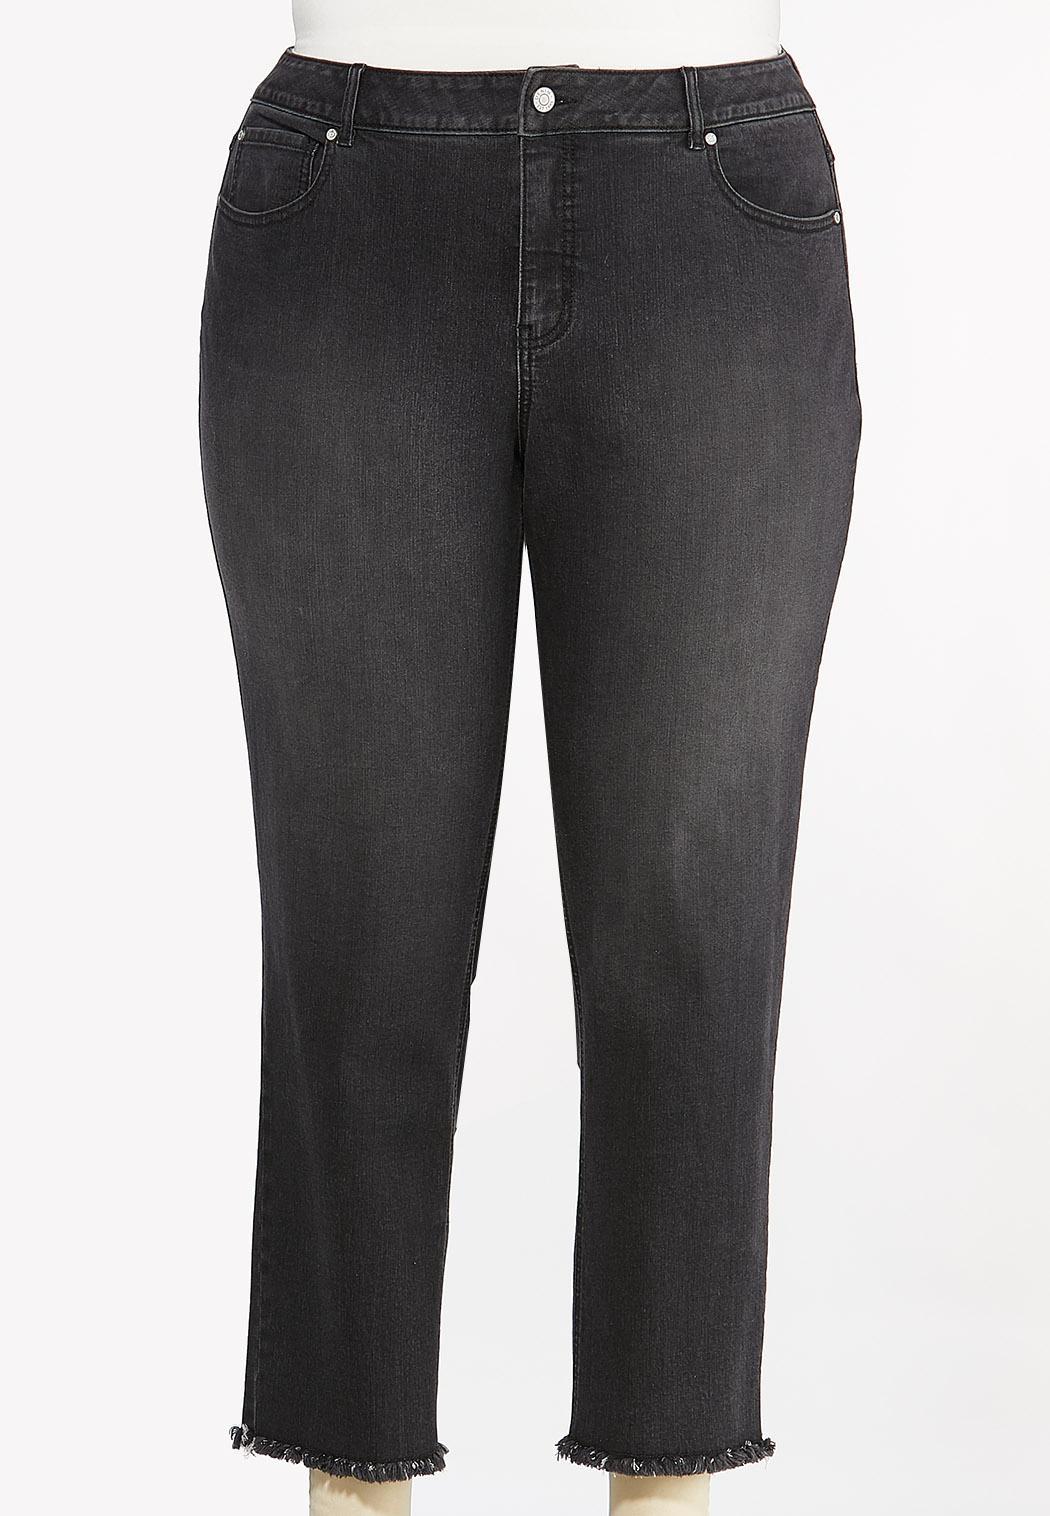 Plus Size Black Skinny Ankle Jeans